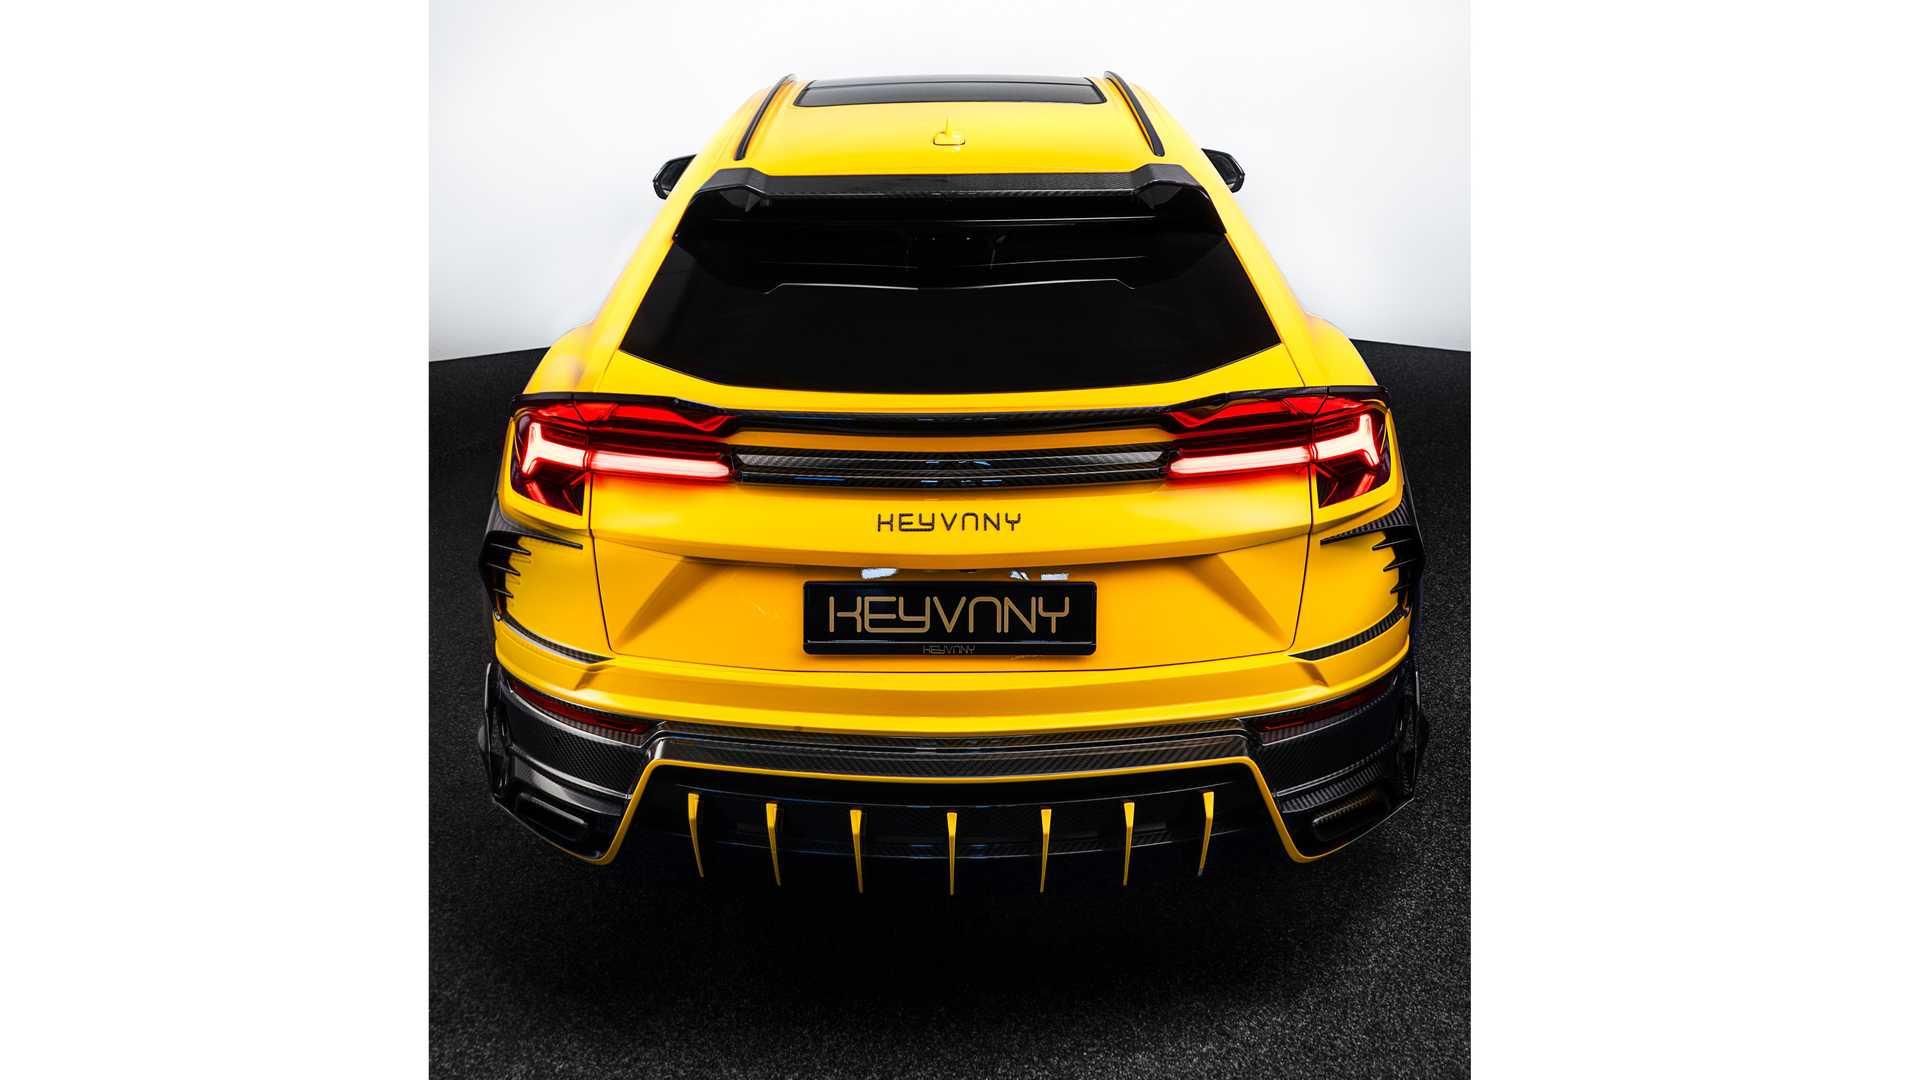 Lamborghini-Urus-by-Keyvany-8